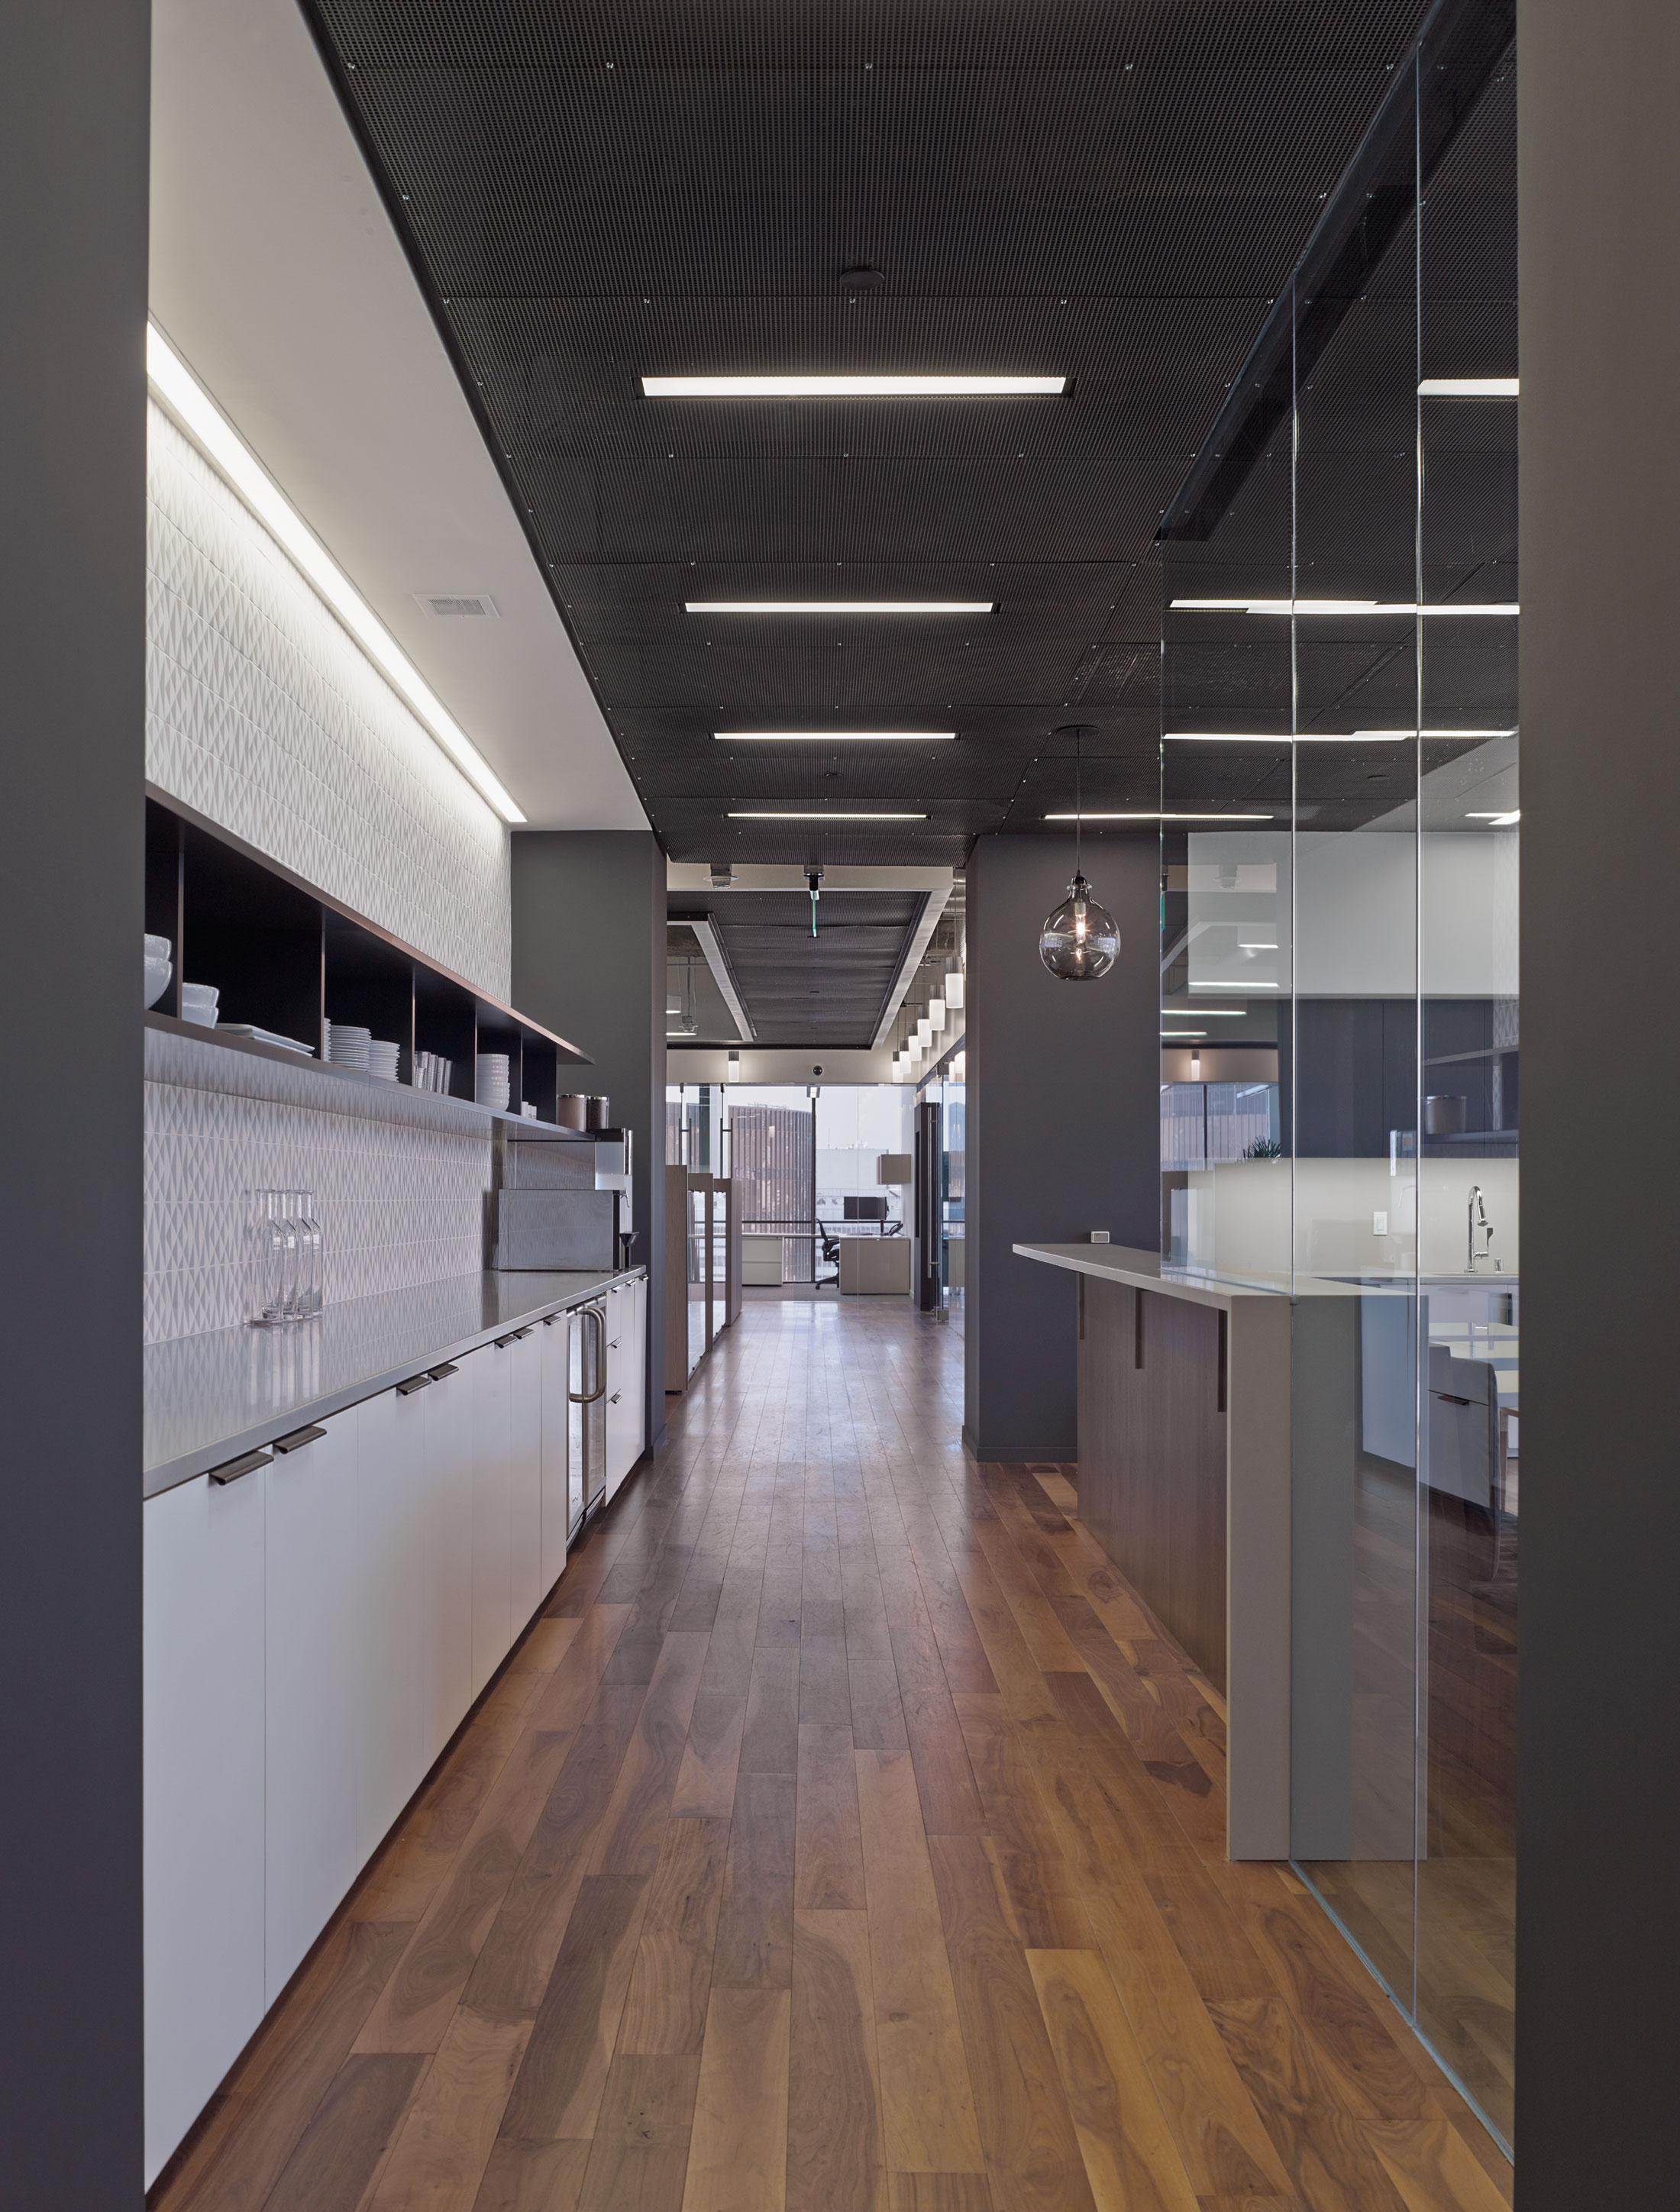 modern-architecture-commercial-interiors-workplace-office-custom-fabrication-california-shubindonaldson-freemark-financial-01